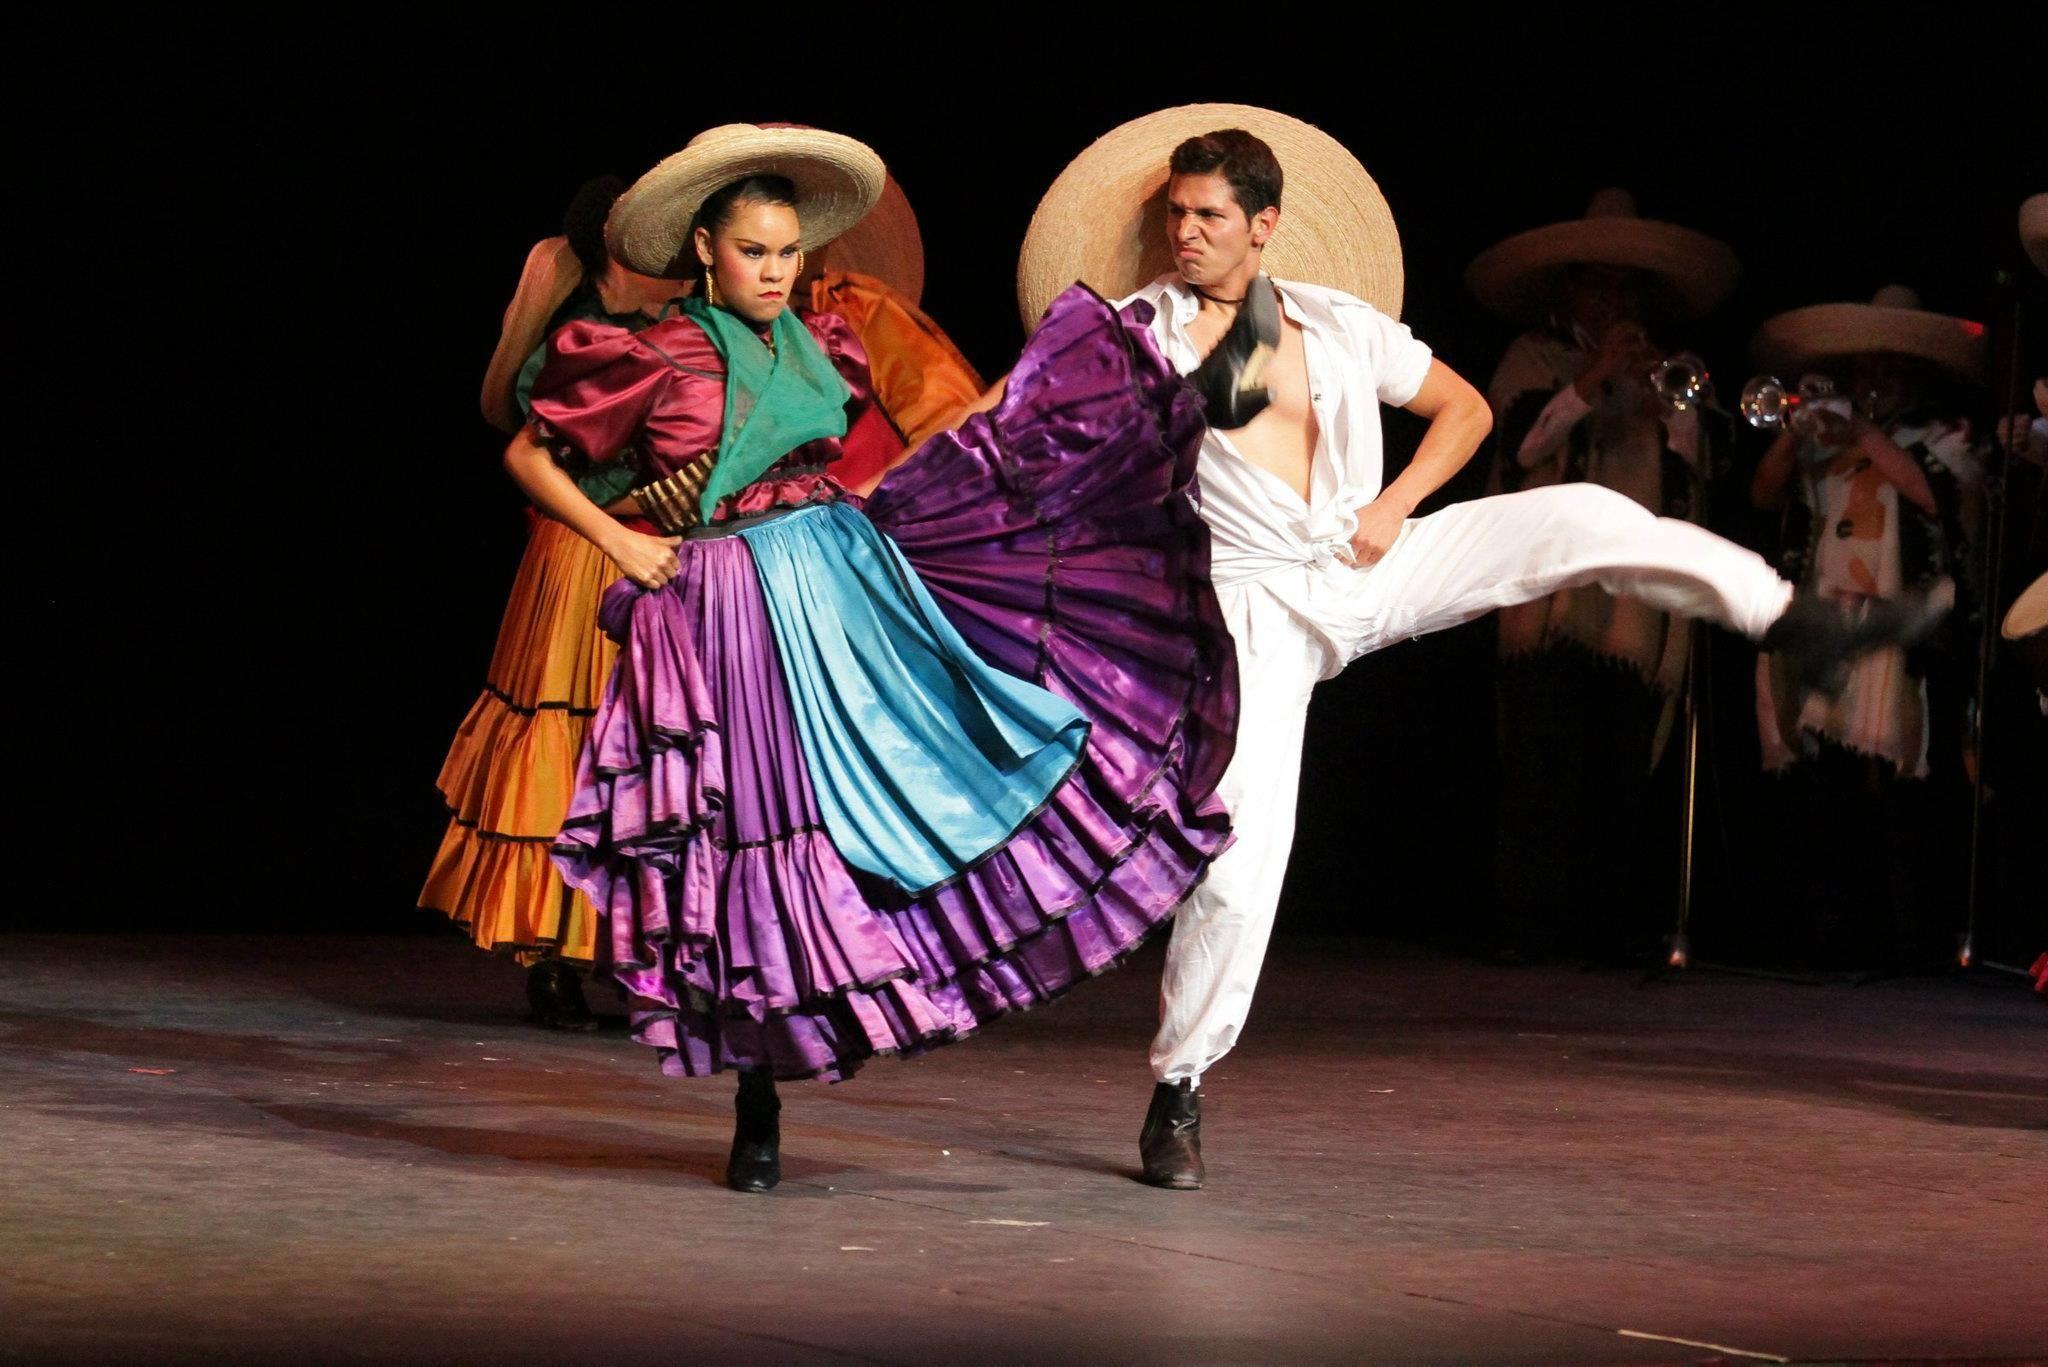 Ballet Folklorico De Amalia Hernandez Ballet Folklorico De Mexico De Amalia Hernandez Notimx Ballet Folklorico Dancer Costume Mexico Culture